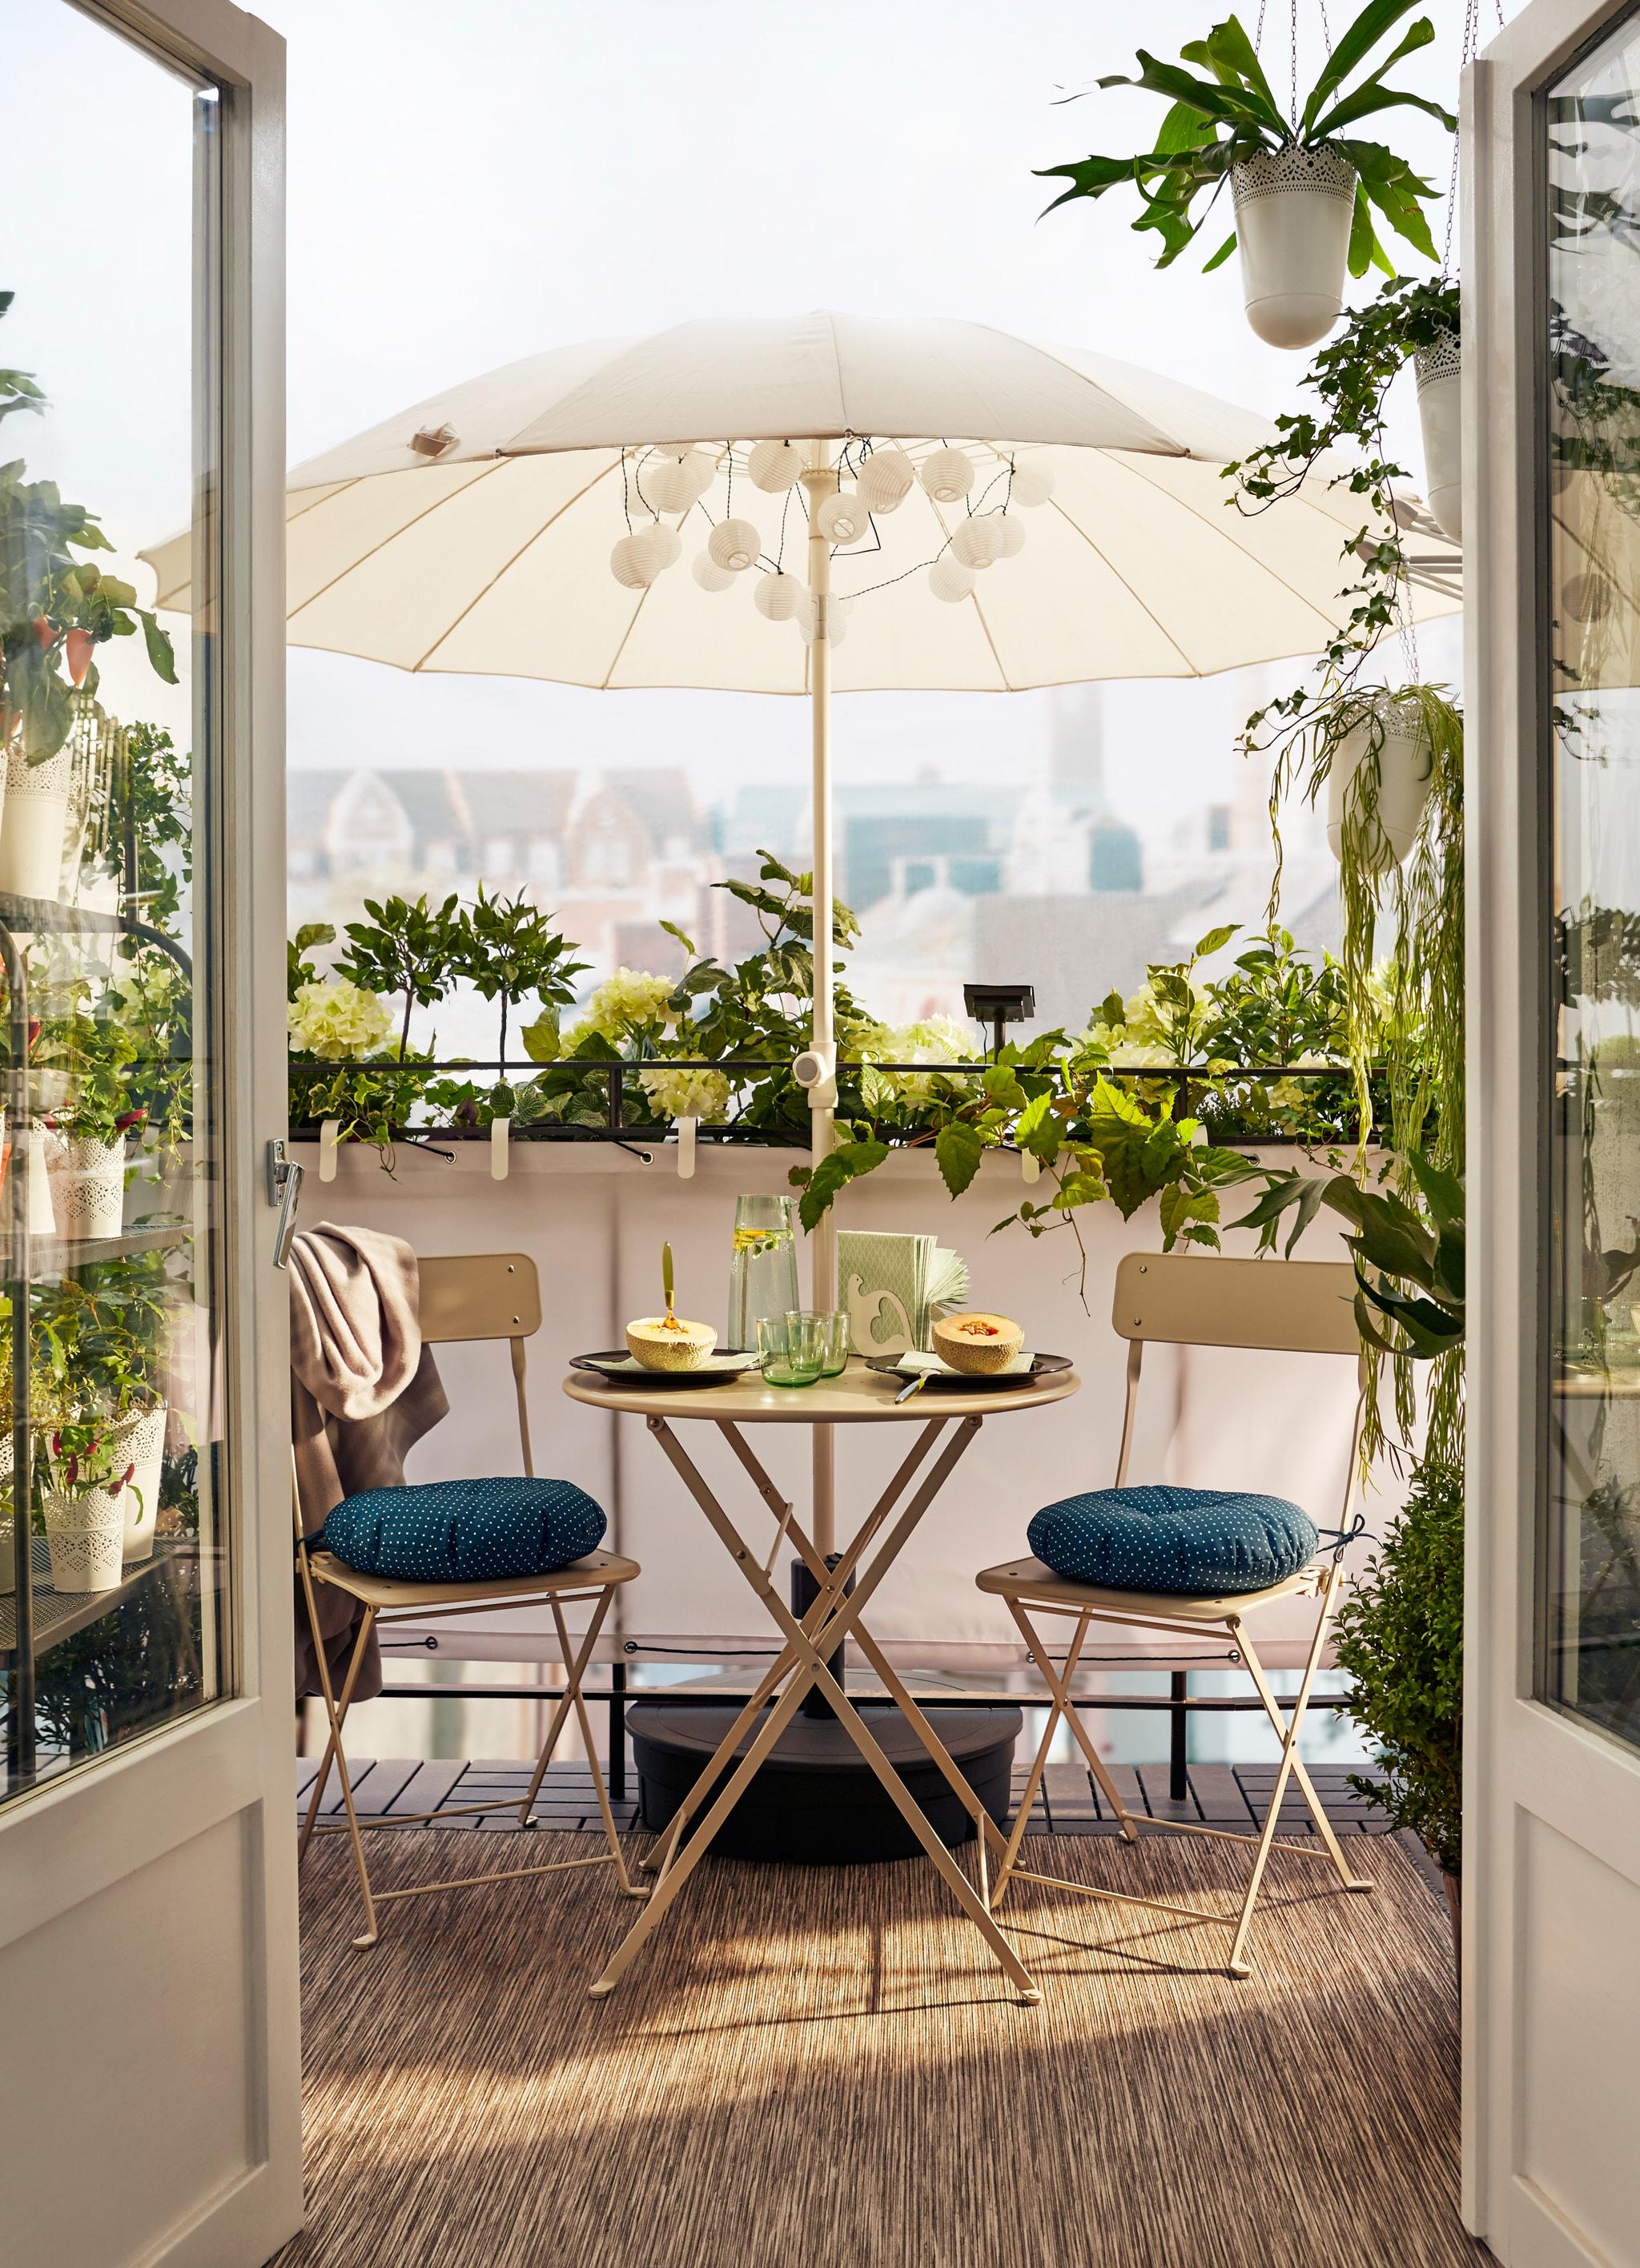 Muebles De Terraza Ikea D0dg Muebles De Jardà N Y Terraza Muebles De Exterior Pra Online Ikea